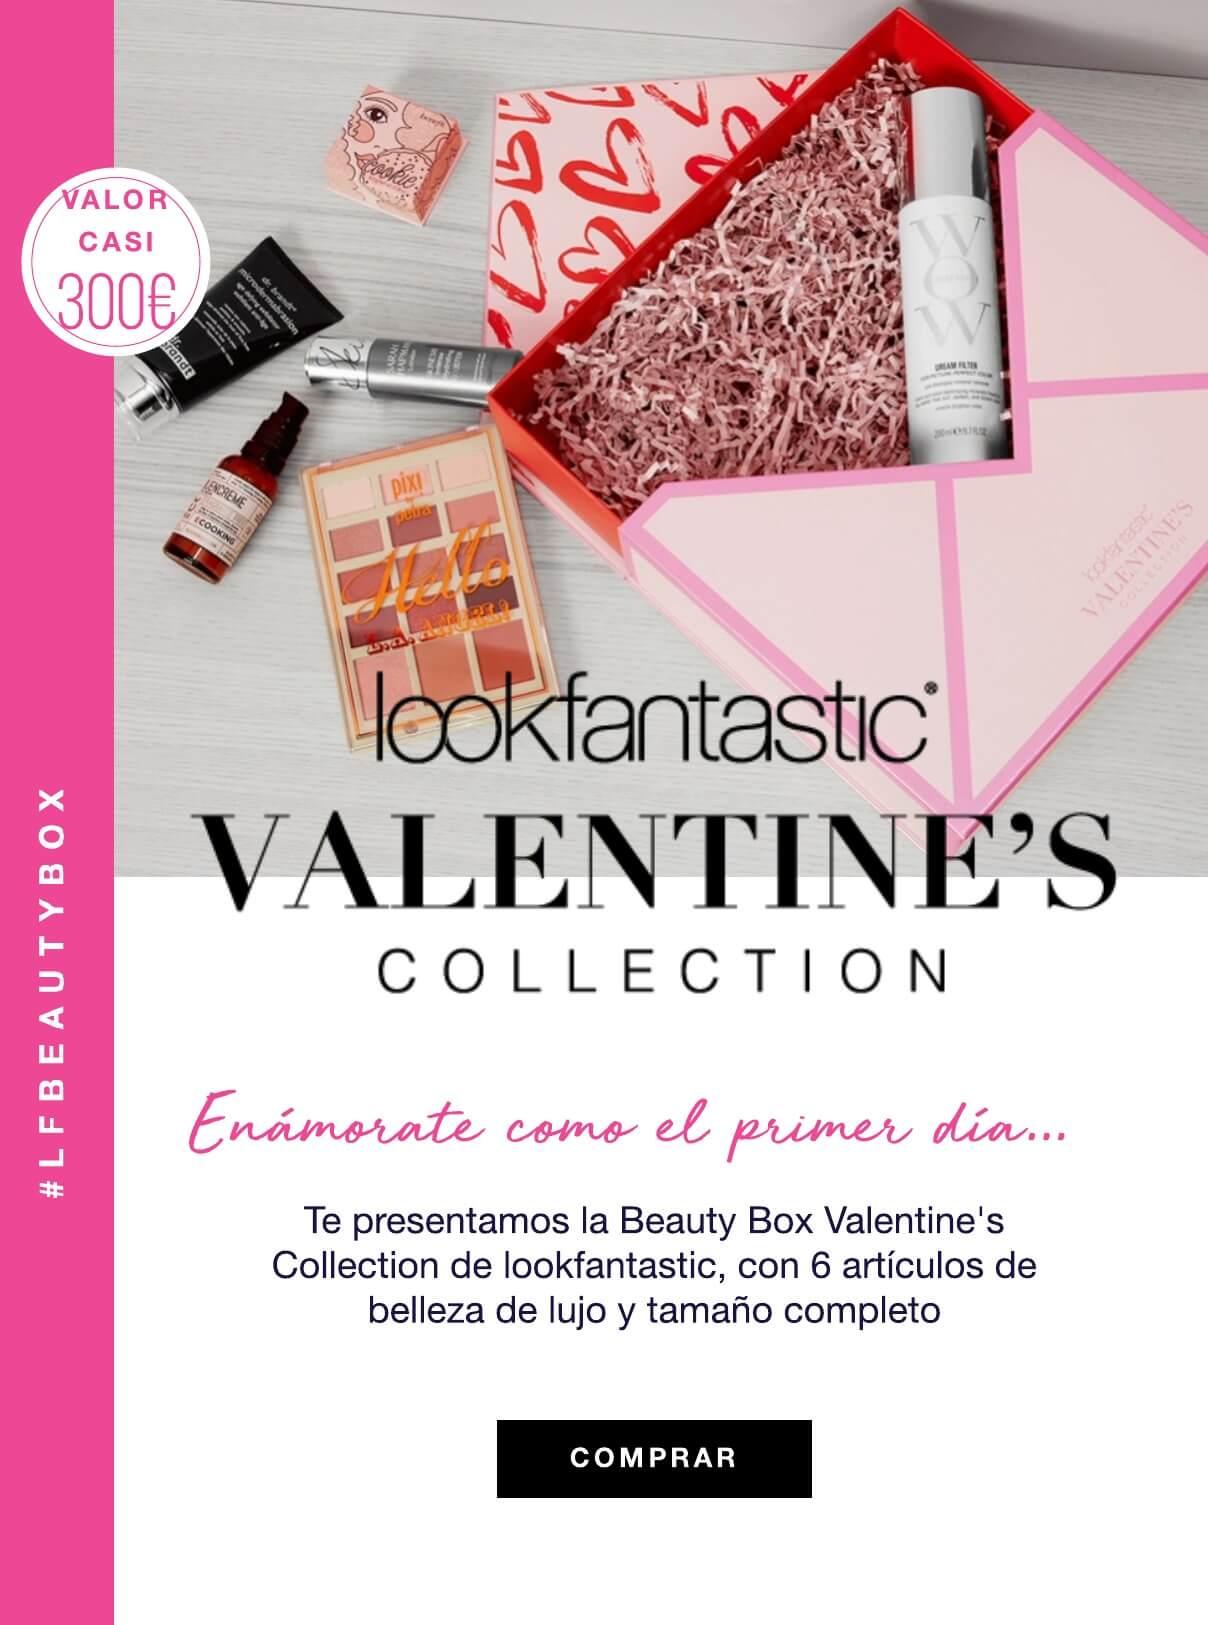 caja edicion limitada san valentin lookfantastic valentines collection beauty box